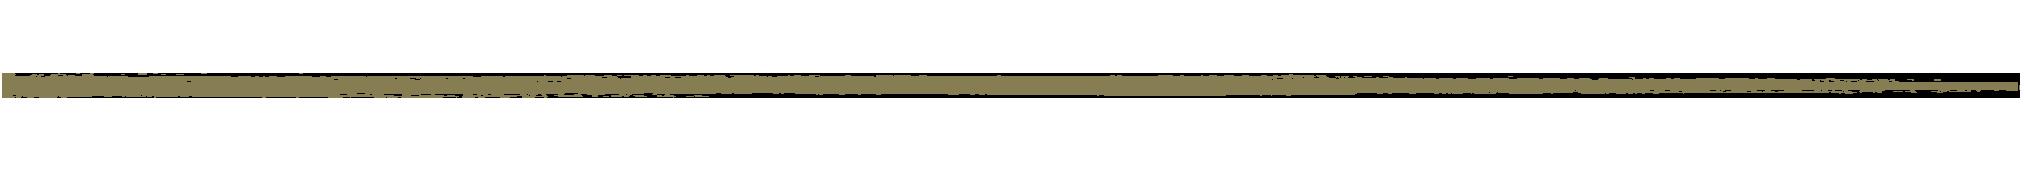 textured-line-bg.png